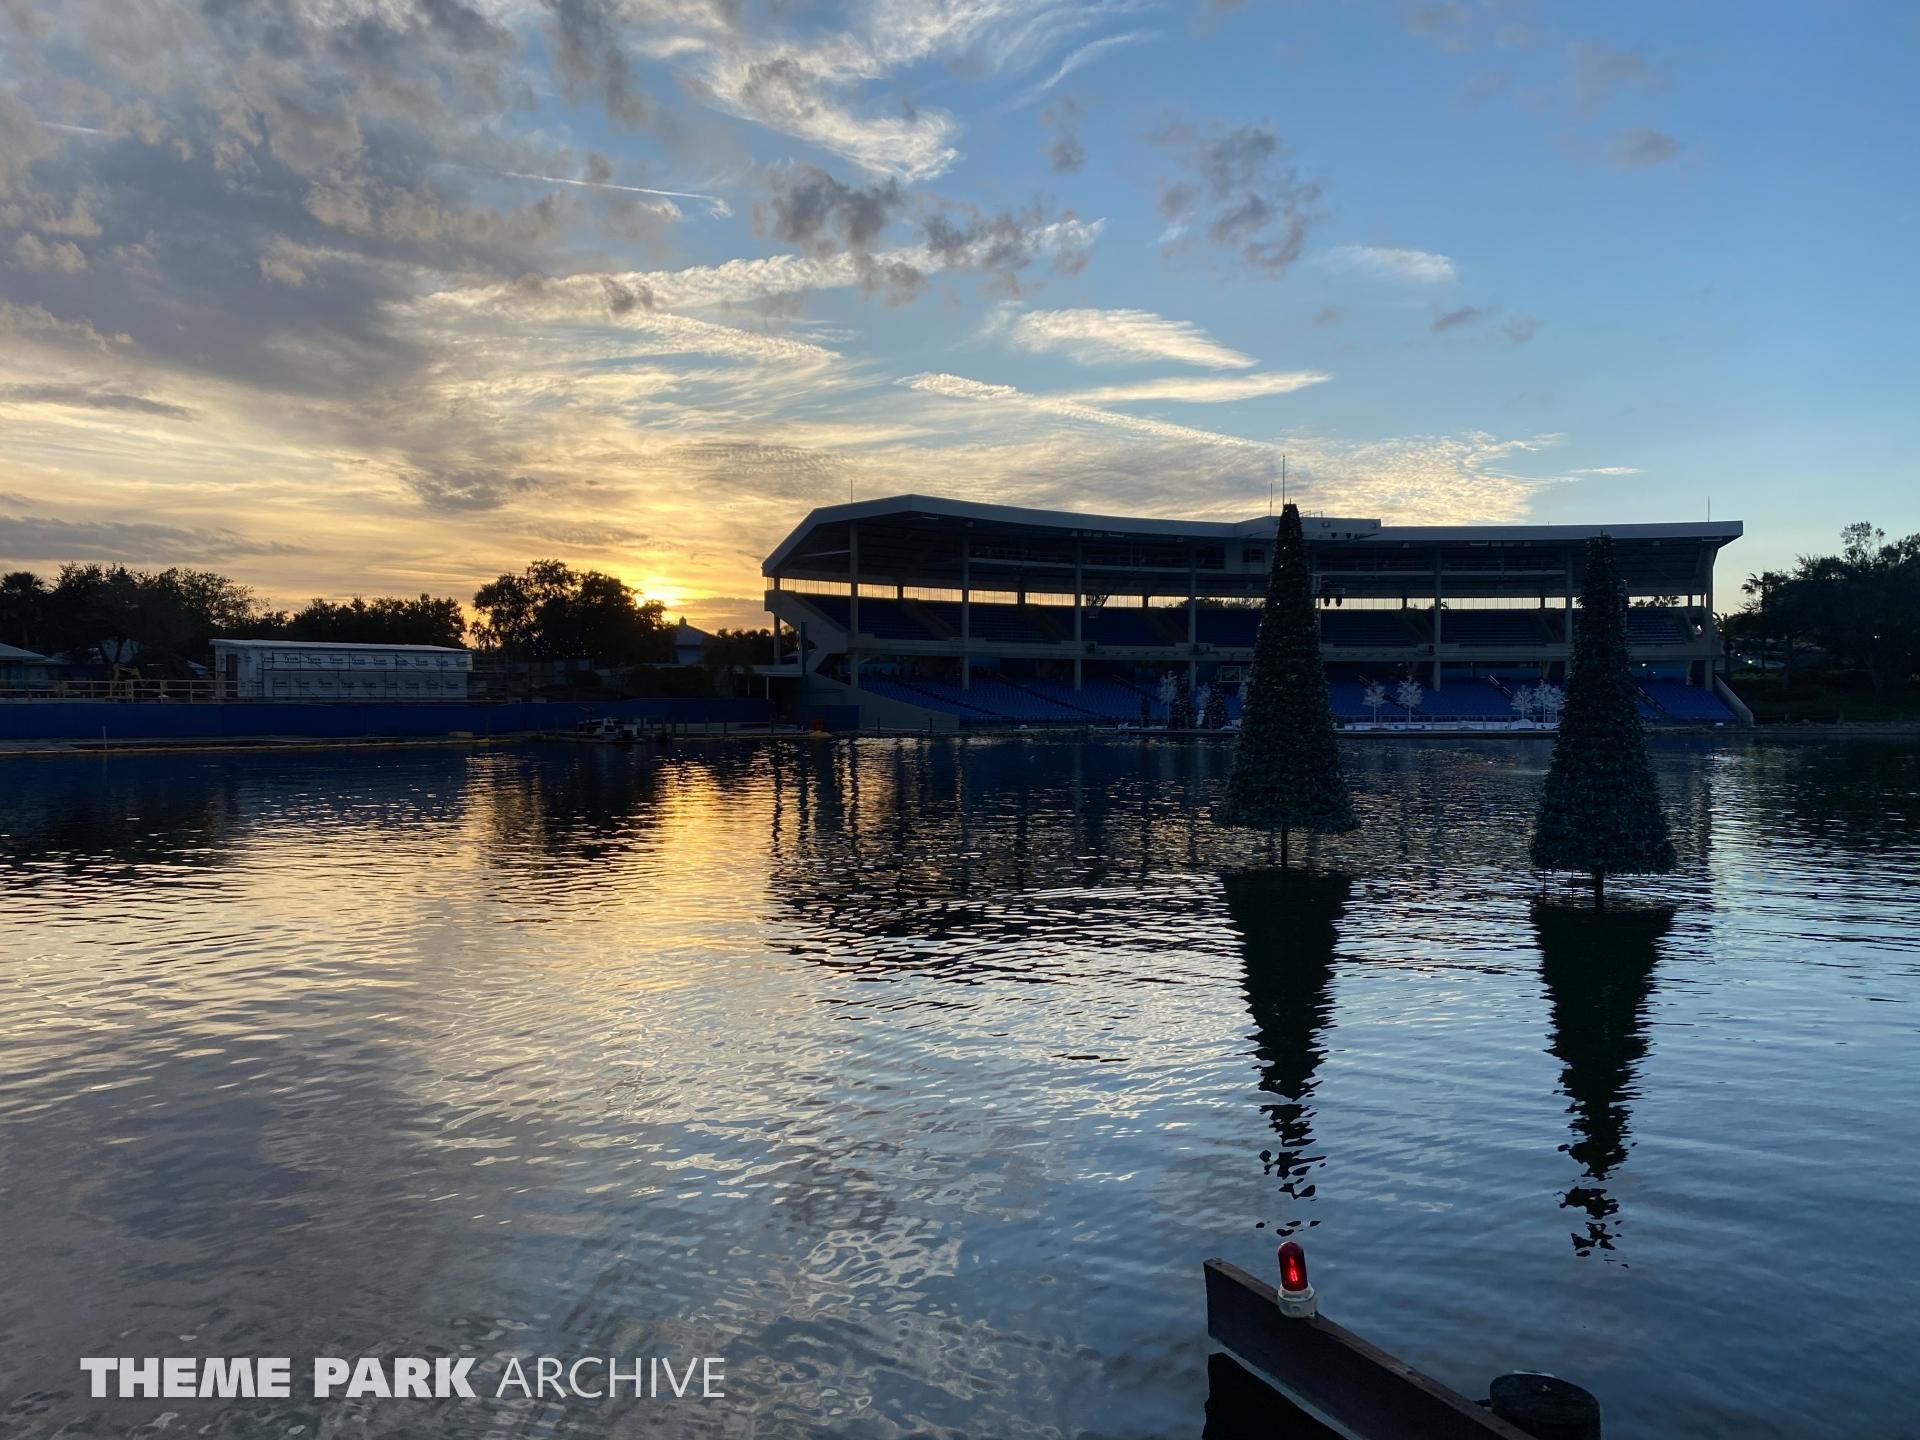 Bayside Stadium at SeaWorld Orlando